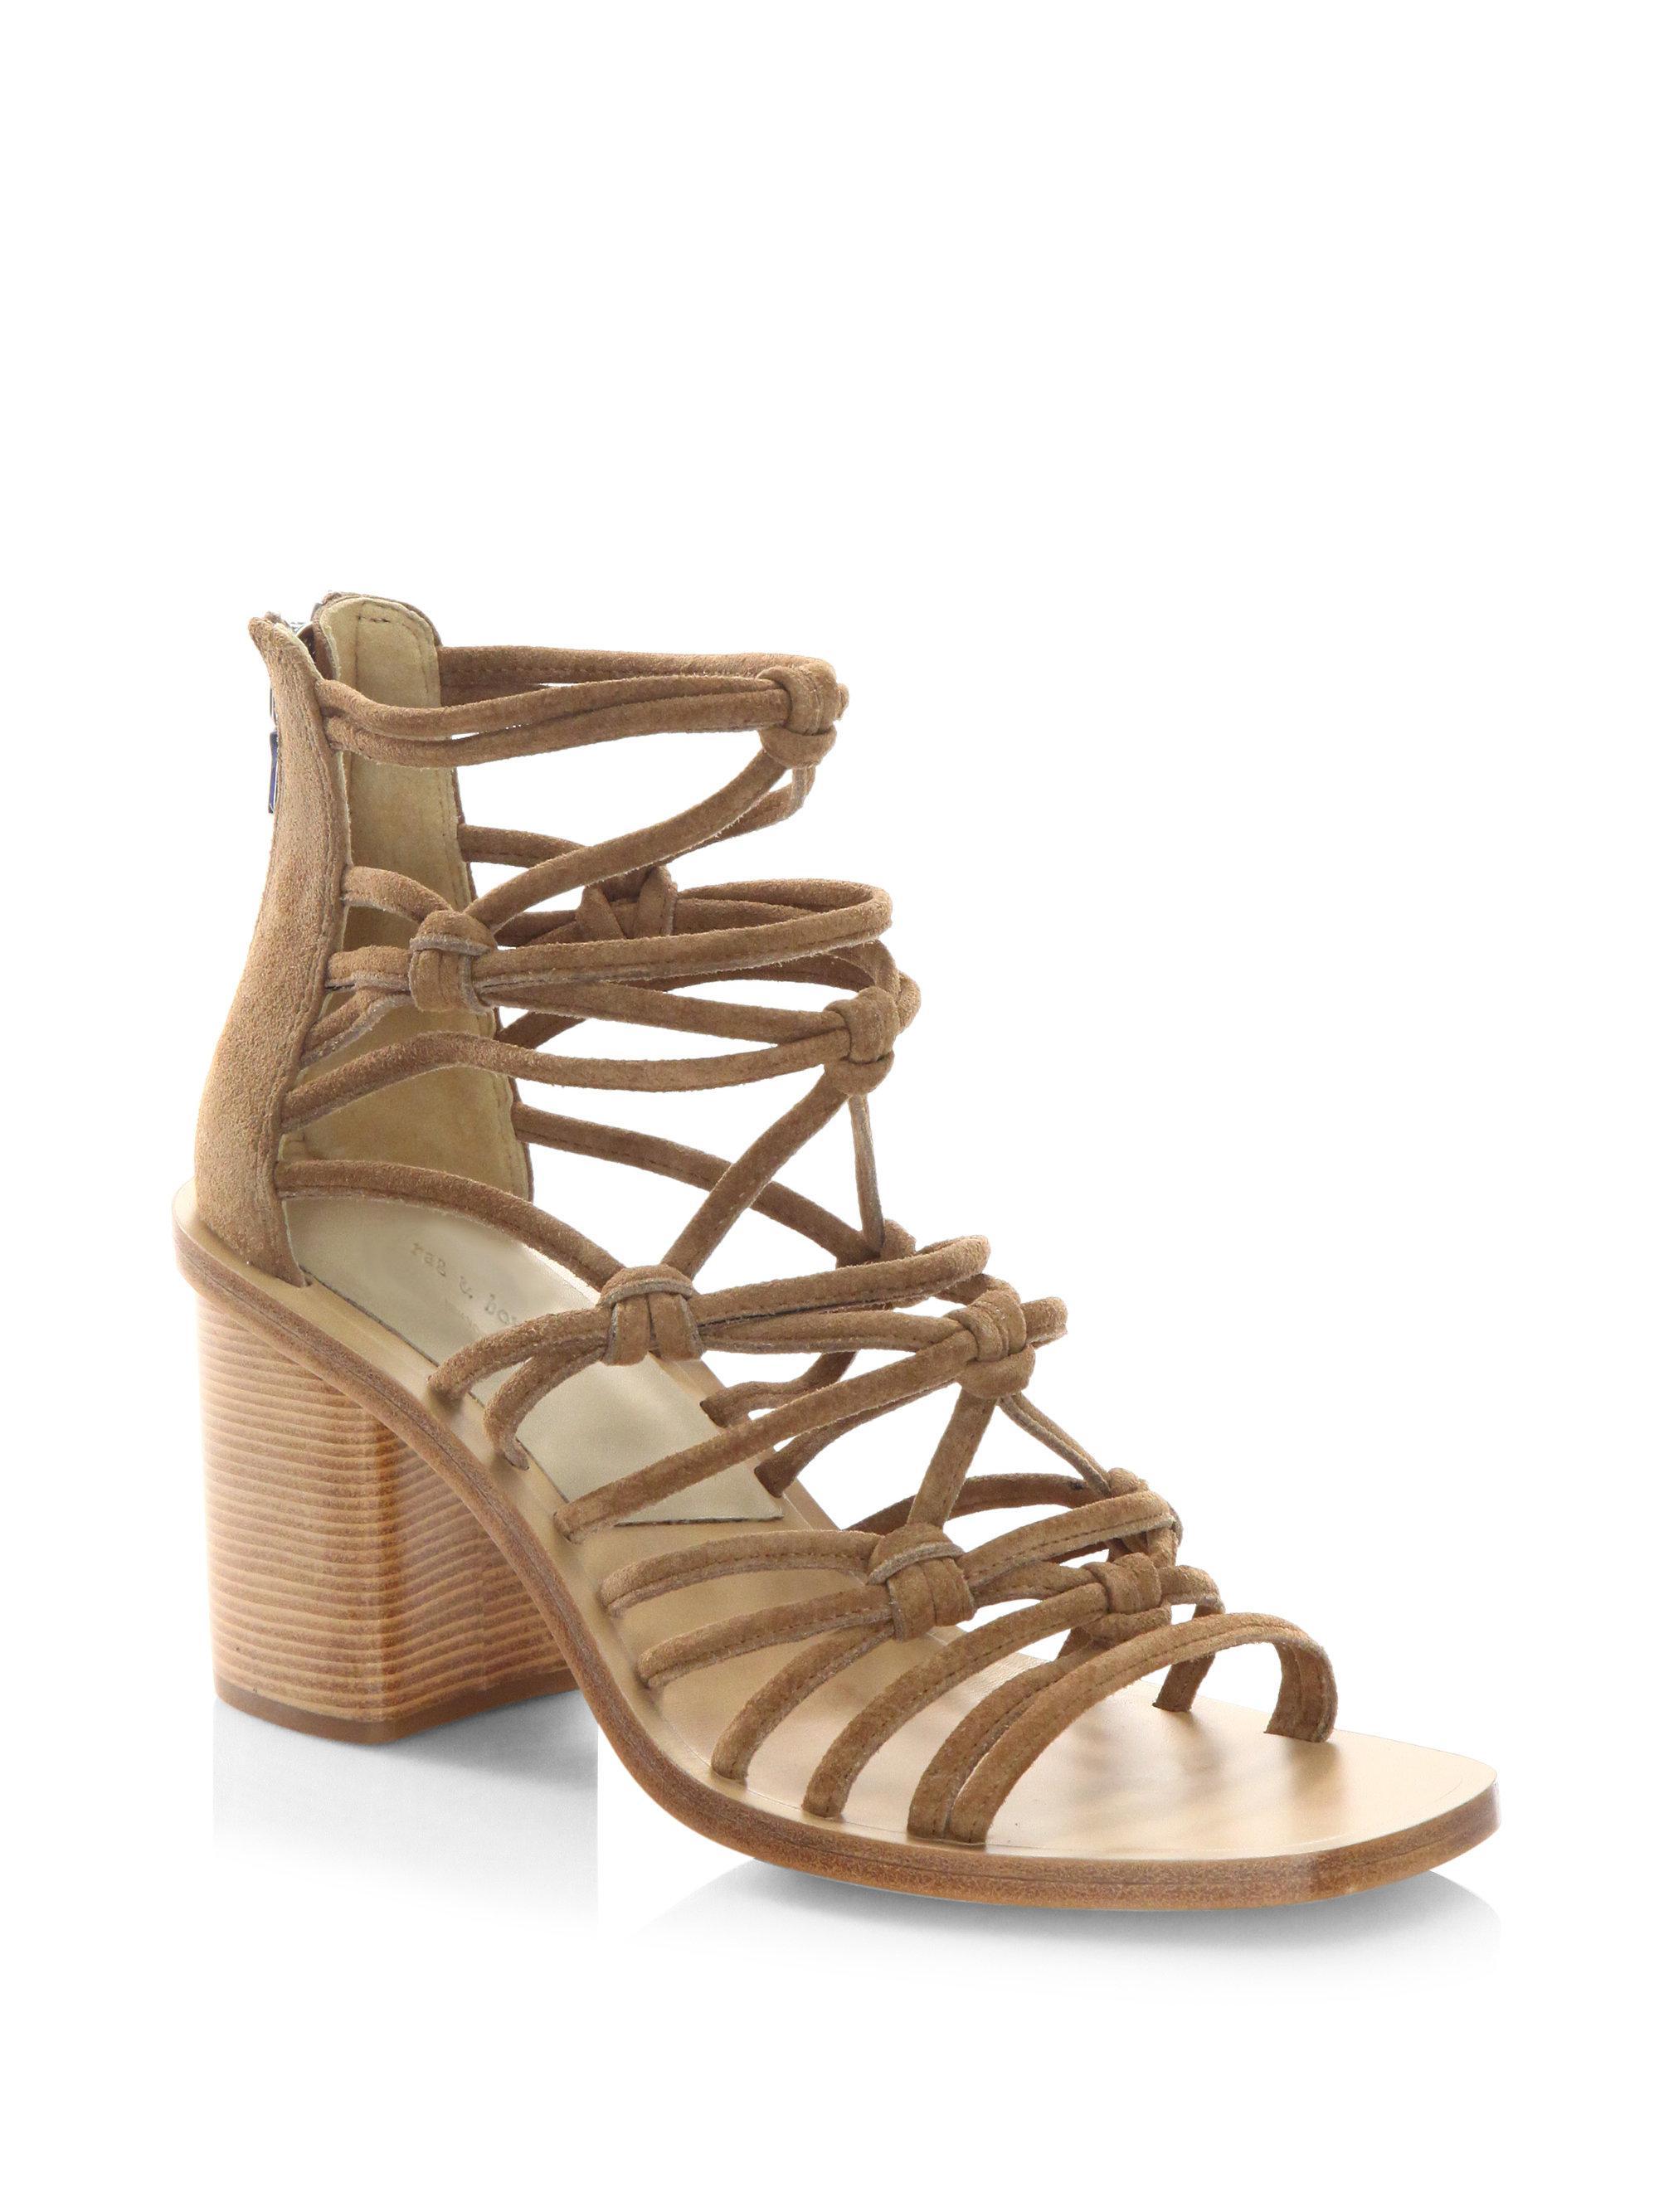 7c0079989fa Lyst - Rag   Bone Camille Macramé Suede Block Heel Sandals in Natural